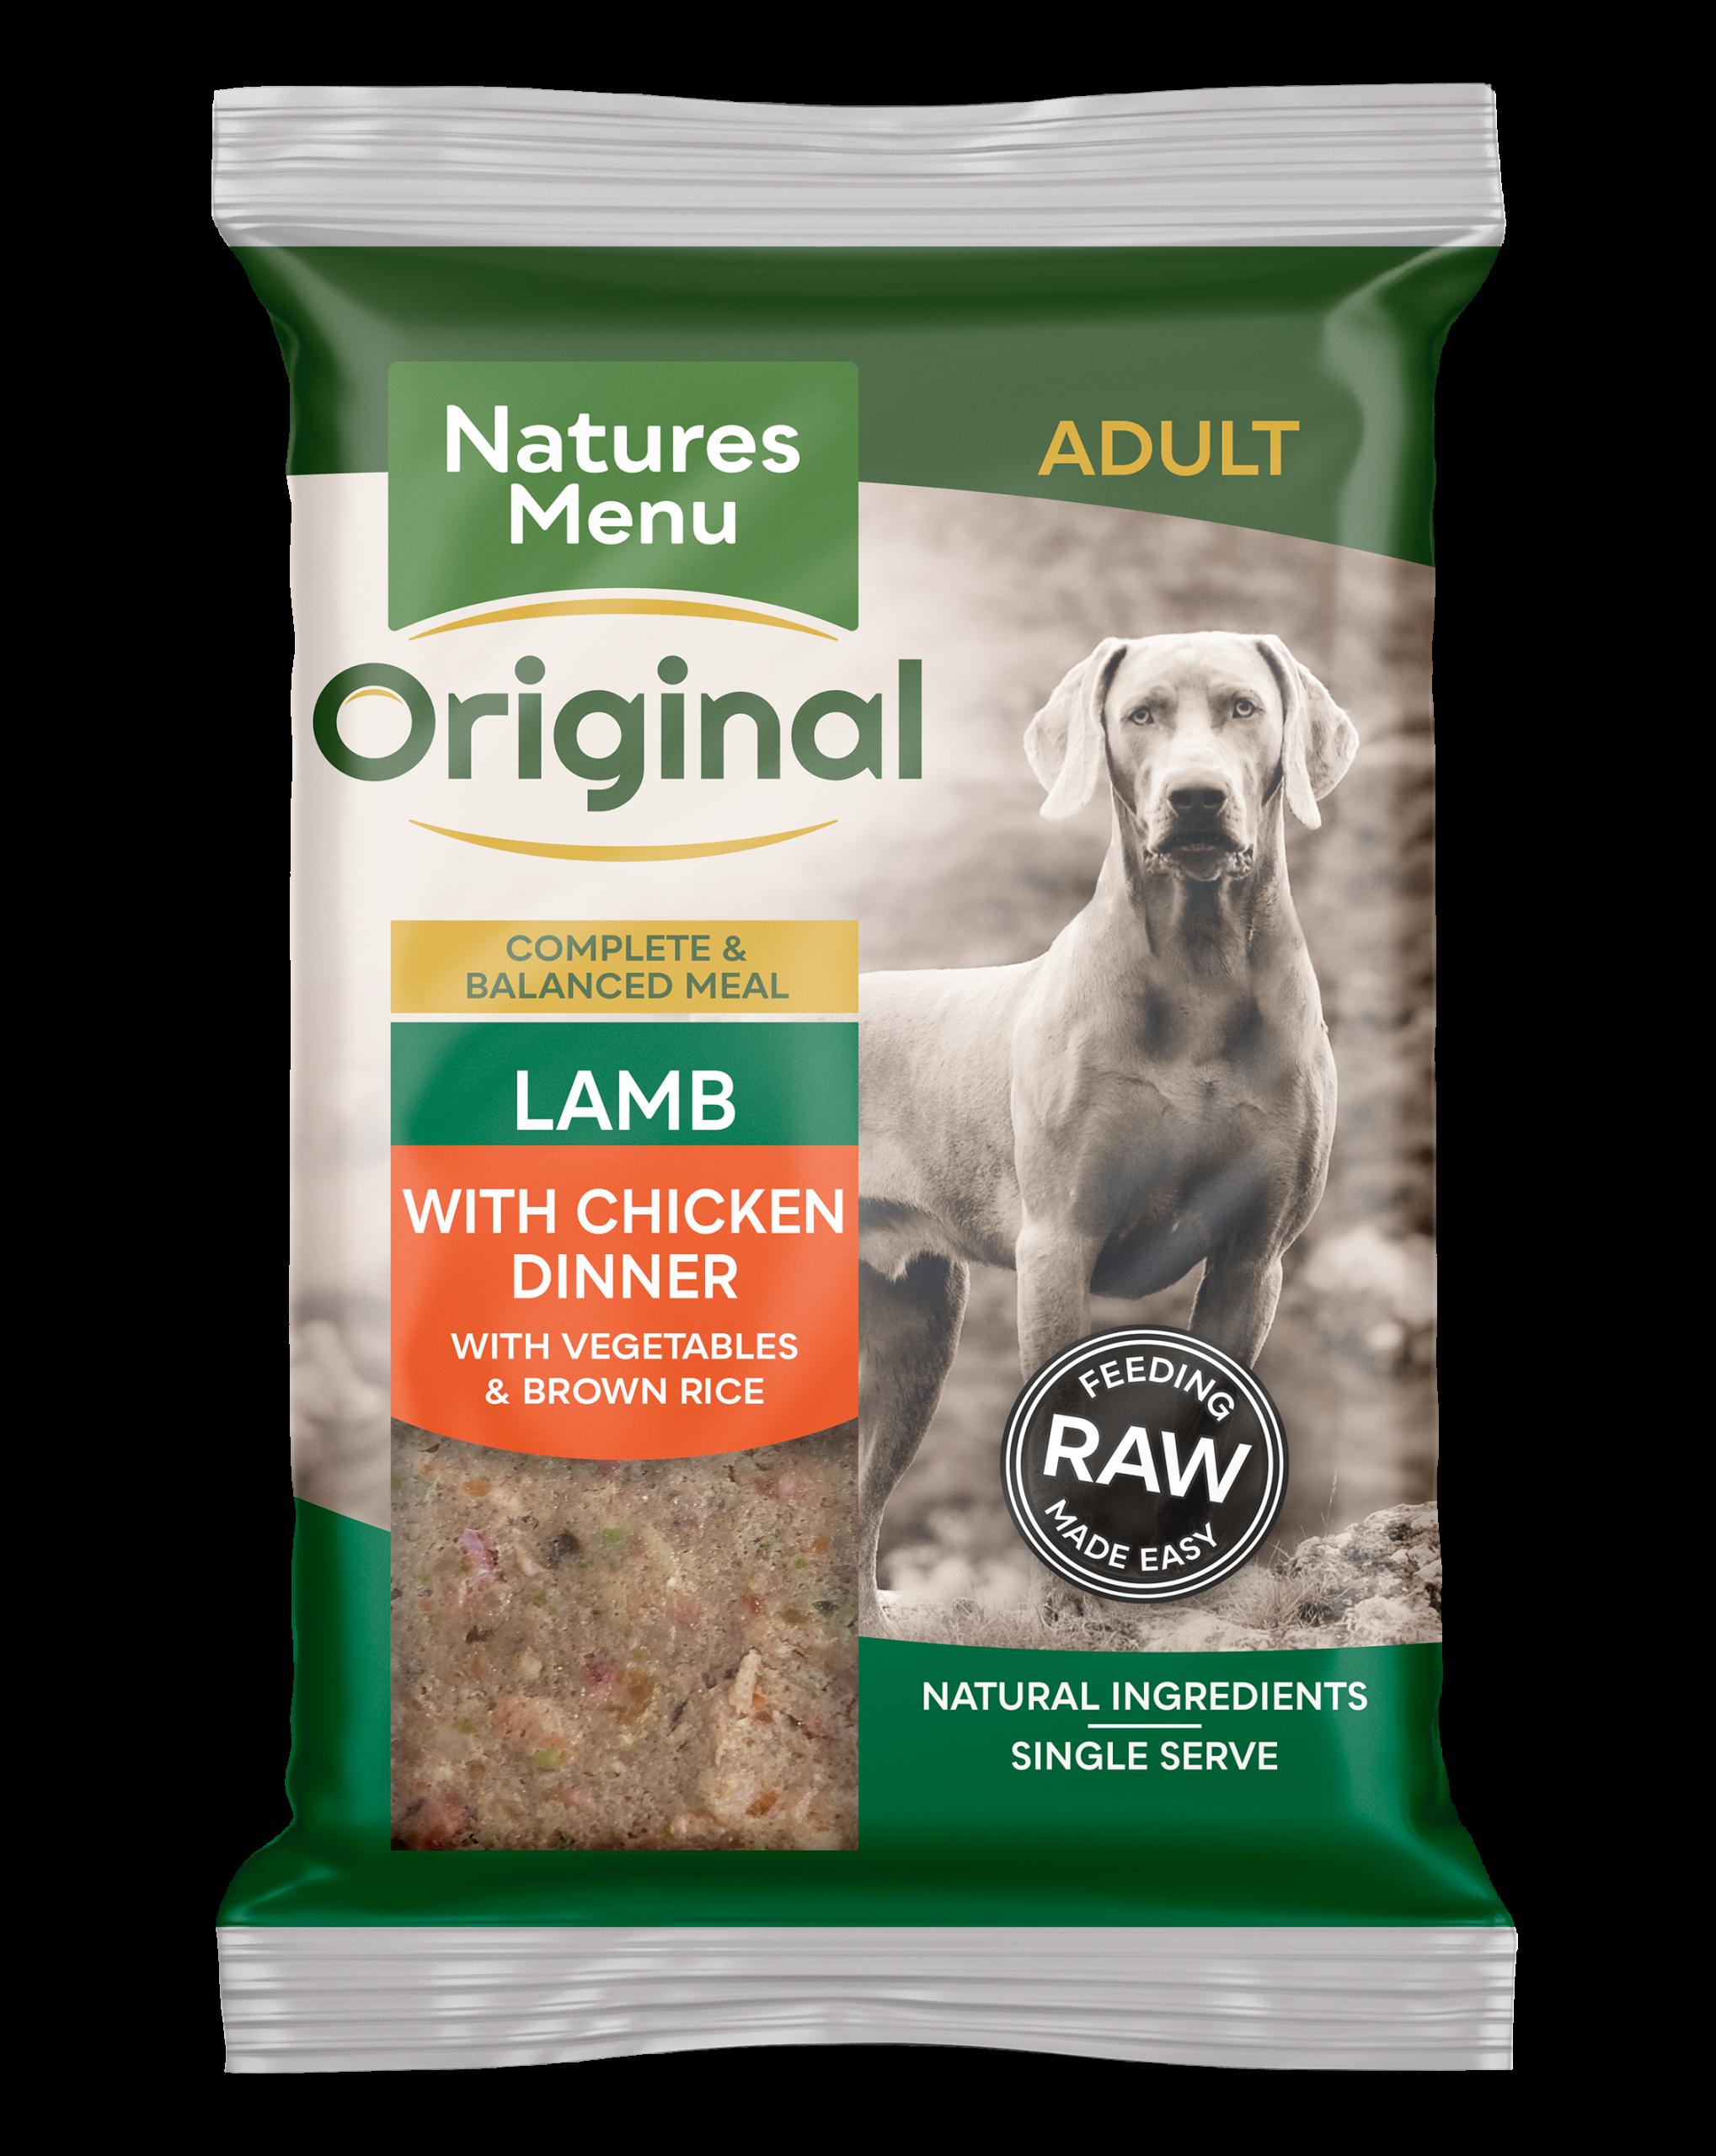 Natures Menu Original Raw Meals Lamb 300g Front of Pack